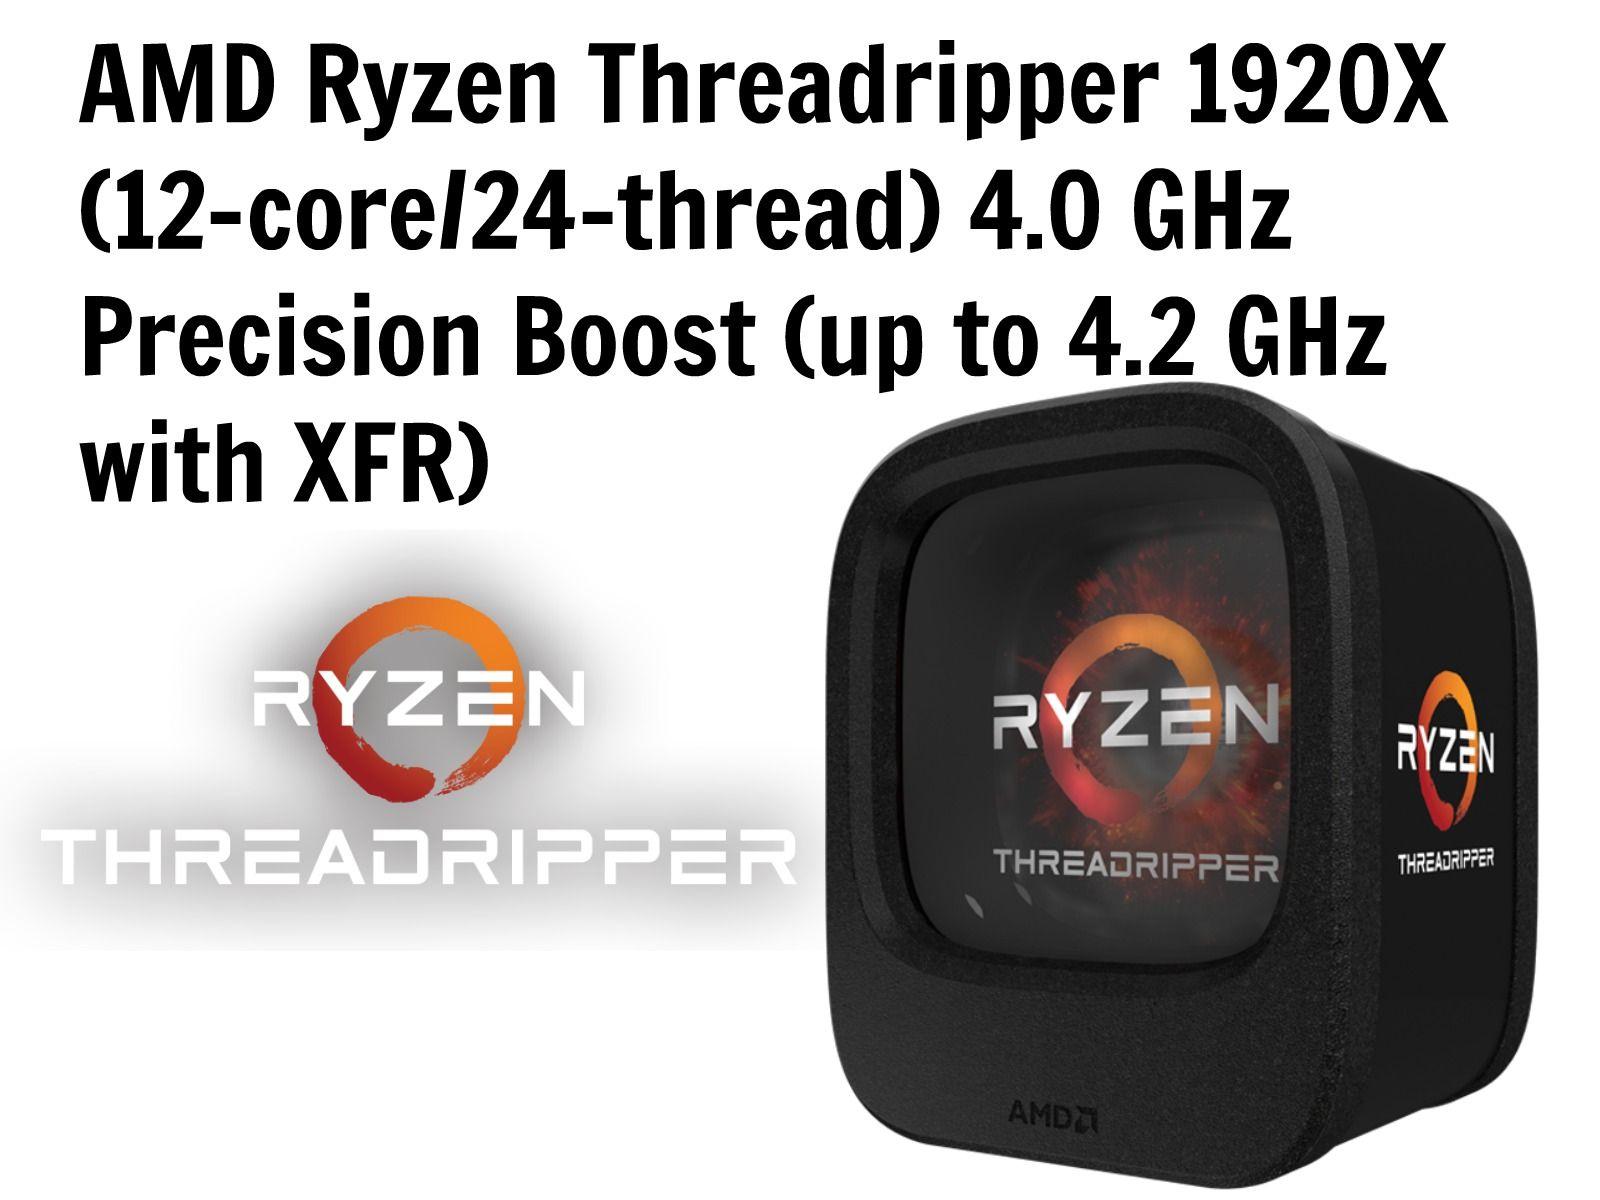 Amd Ryzen Threadripper 1920x 12 Core 24 Thread Amdthreadripper1920x Amd1920x Threadripper Ryzennewcpu Ryzencpu Threadripper1920x Amd Fitbit Zip Thread